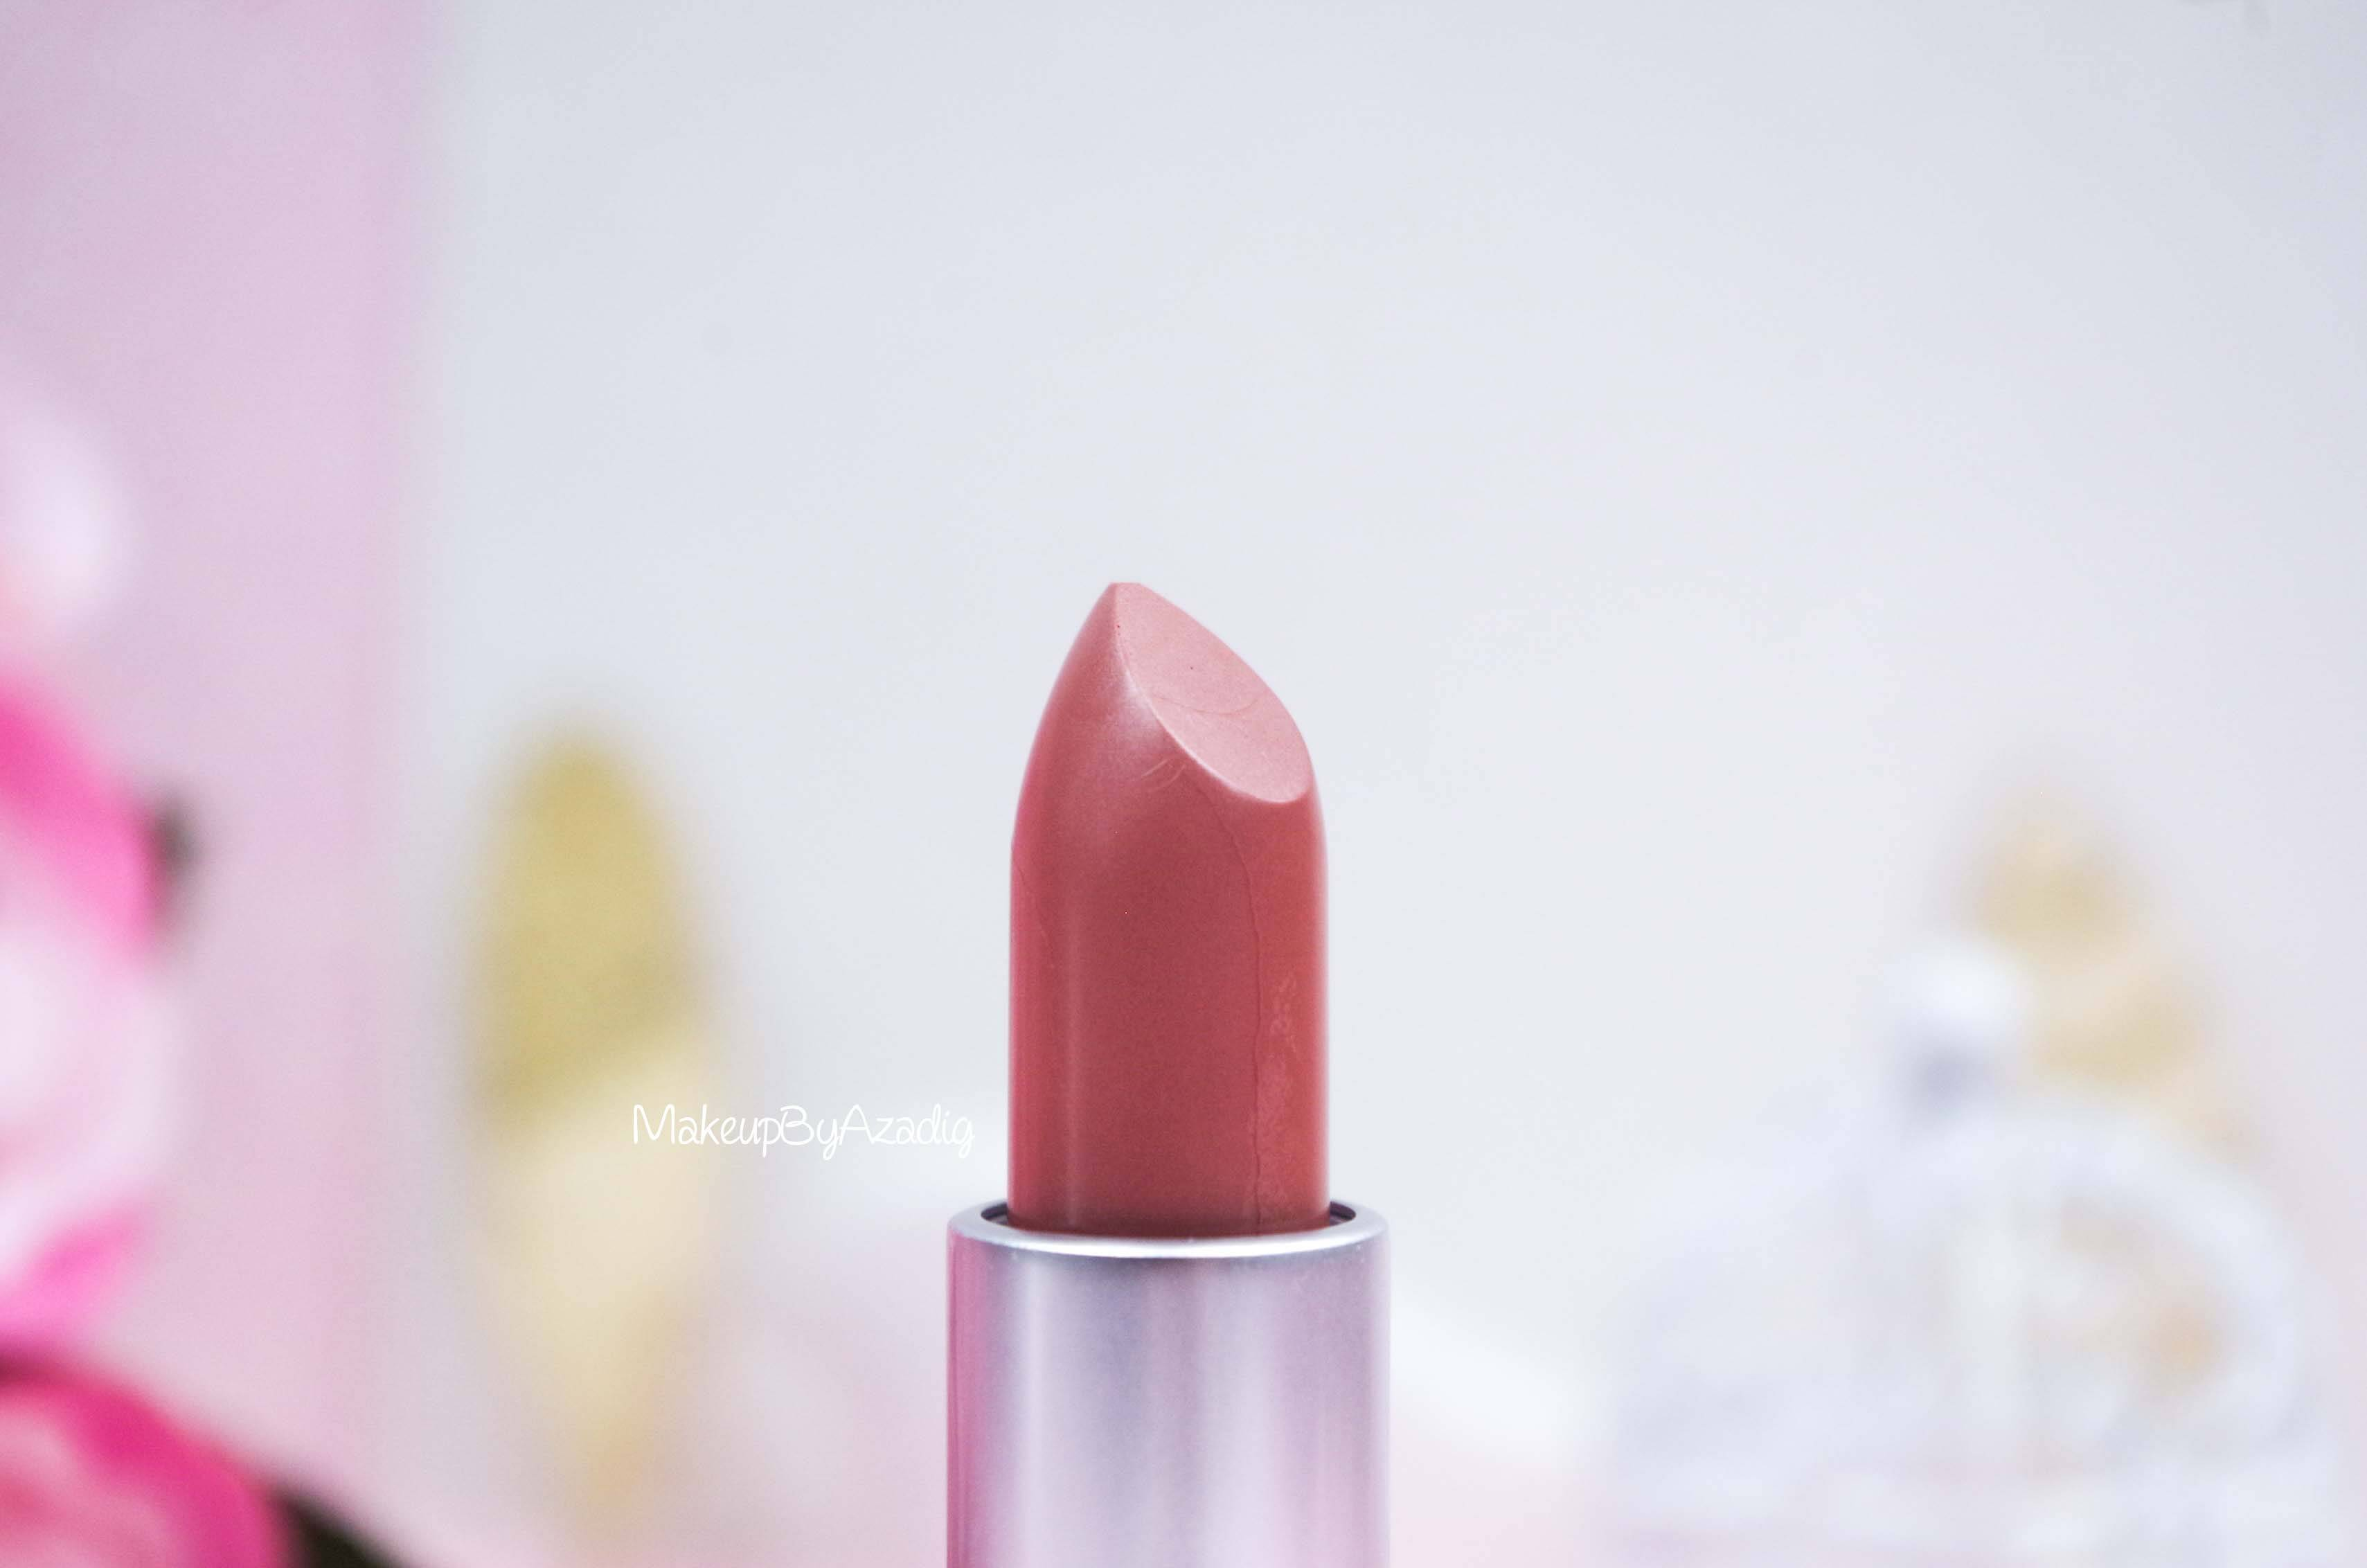 embout-macxmarie-mac-cosmetics-rouge-a-levres-enjoy-phoenix-collaboration-makeupbyazadig-revue-avis-prix-meetup